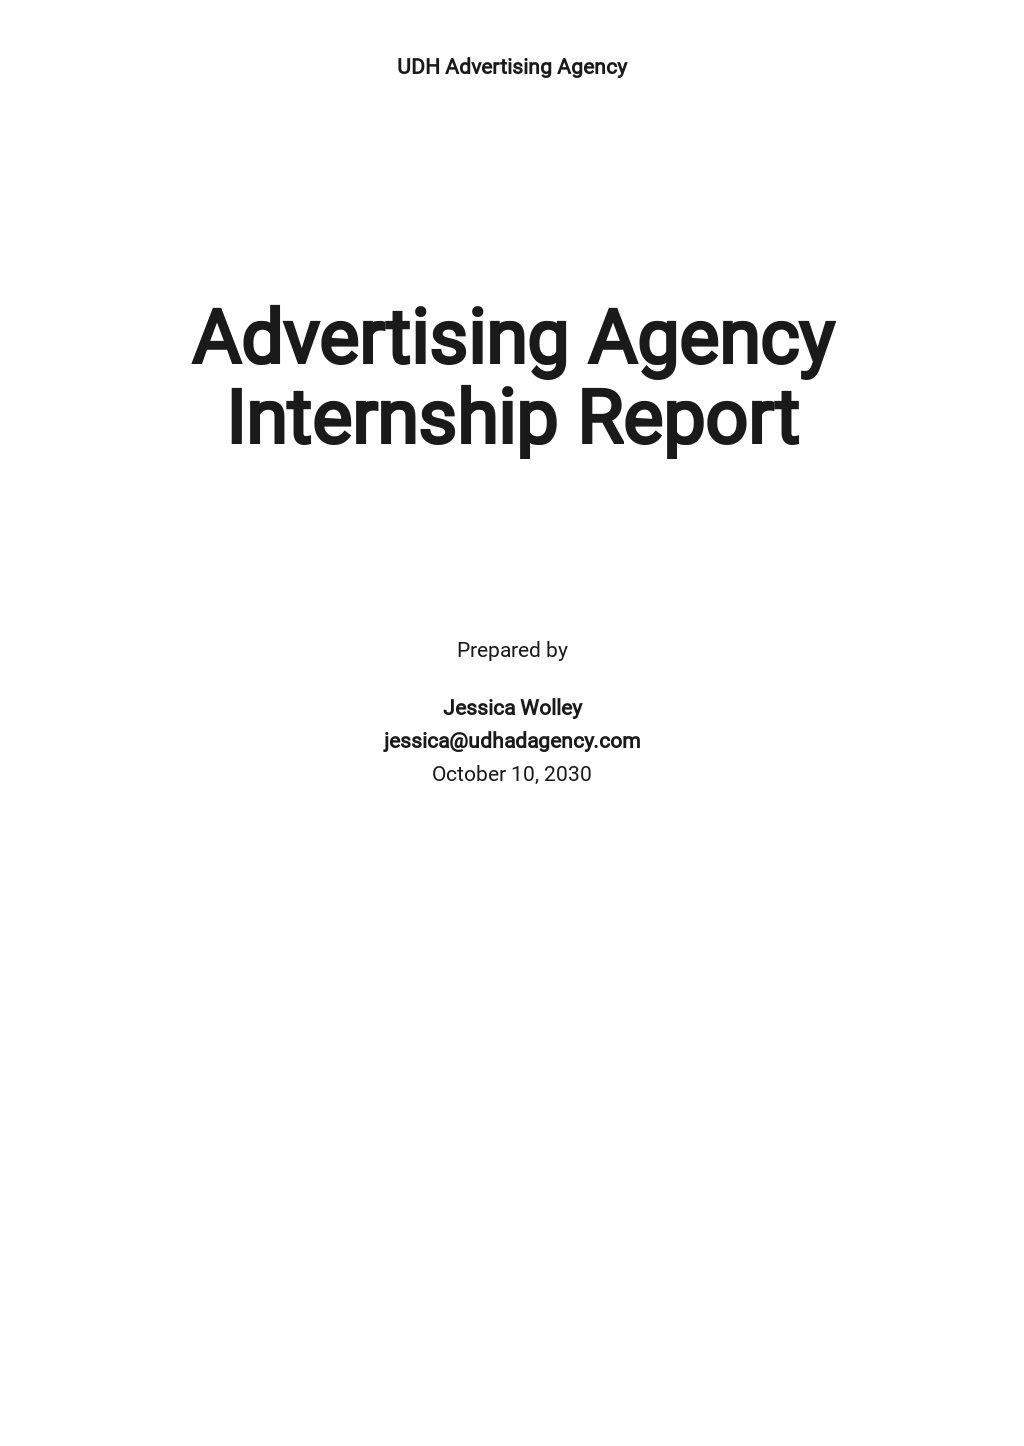 Advertising Agency Internship Report Template.jpe